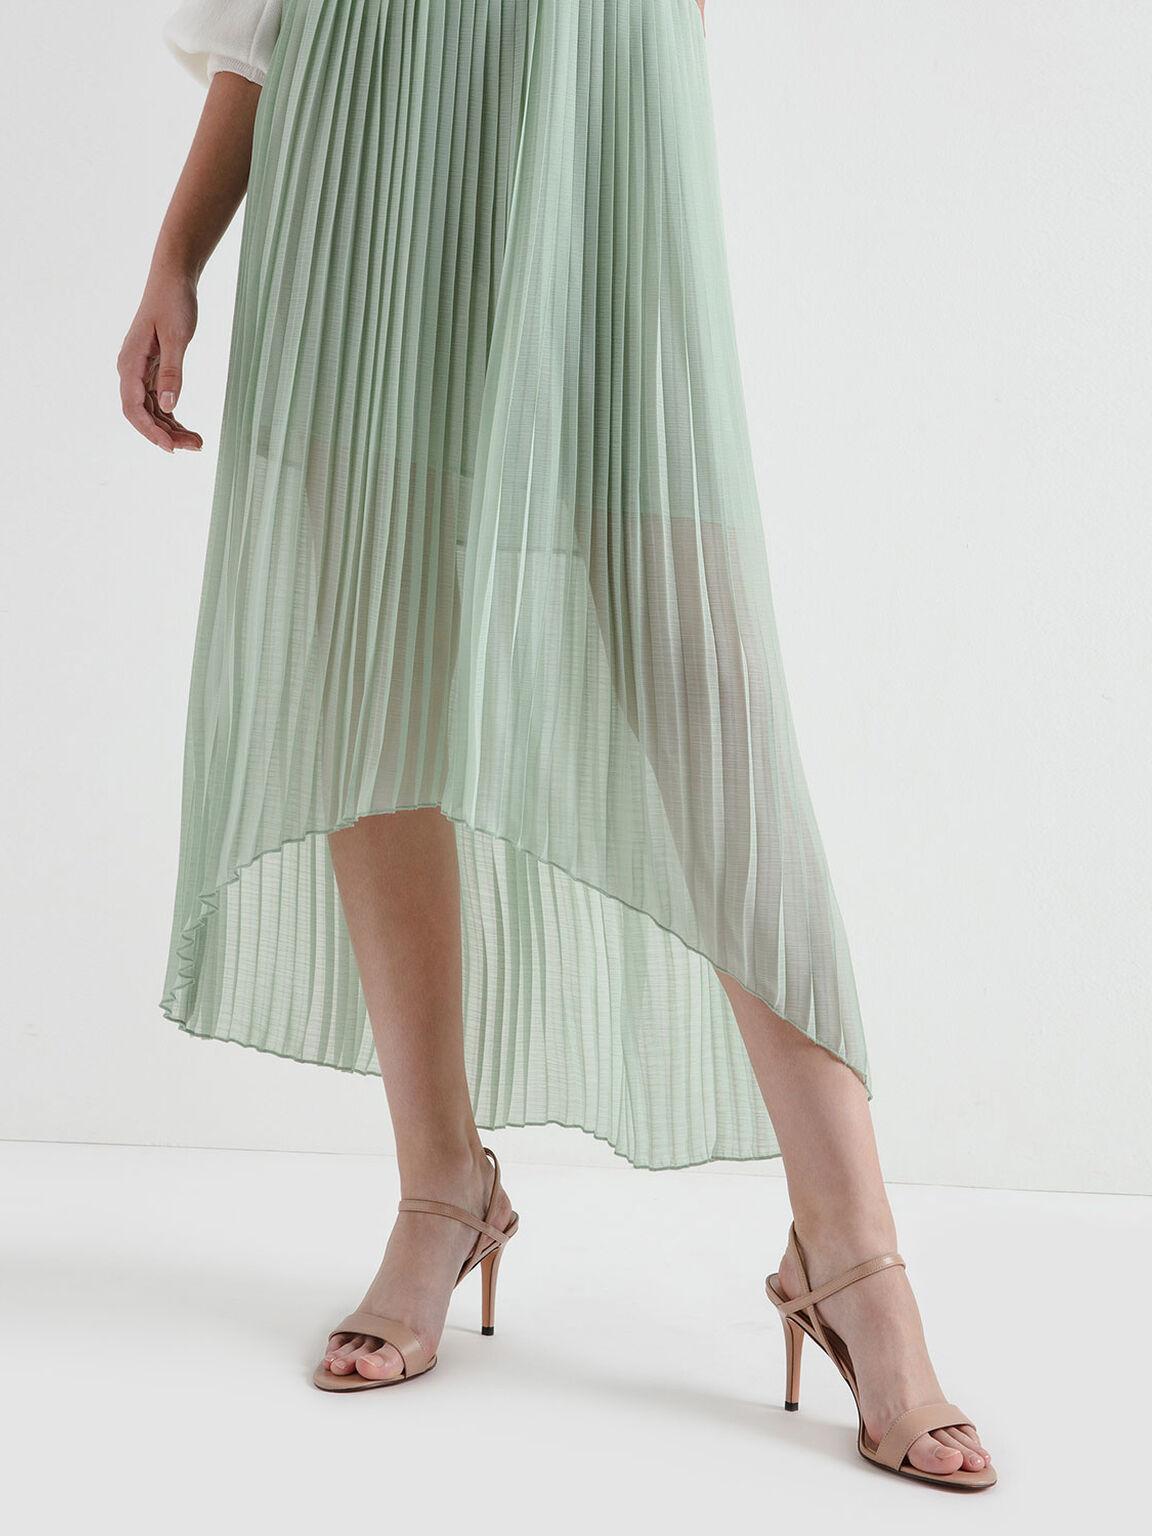 Sandal Classic Stiletto Heel, Nude, hi-res